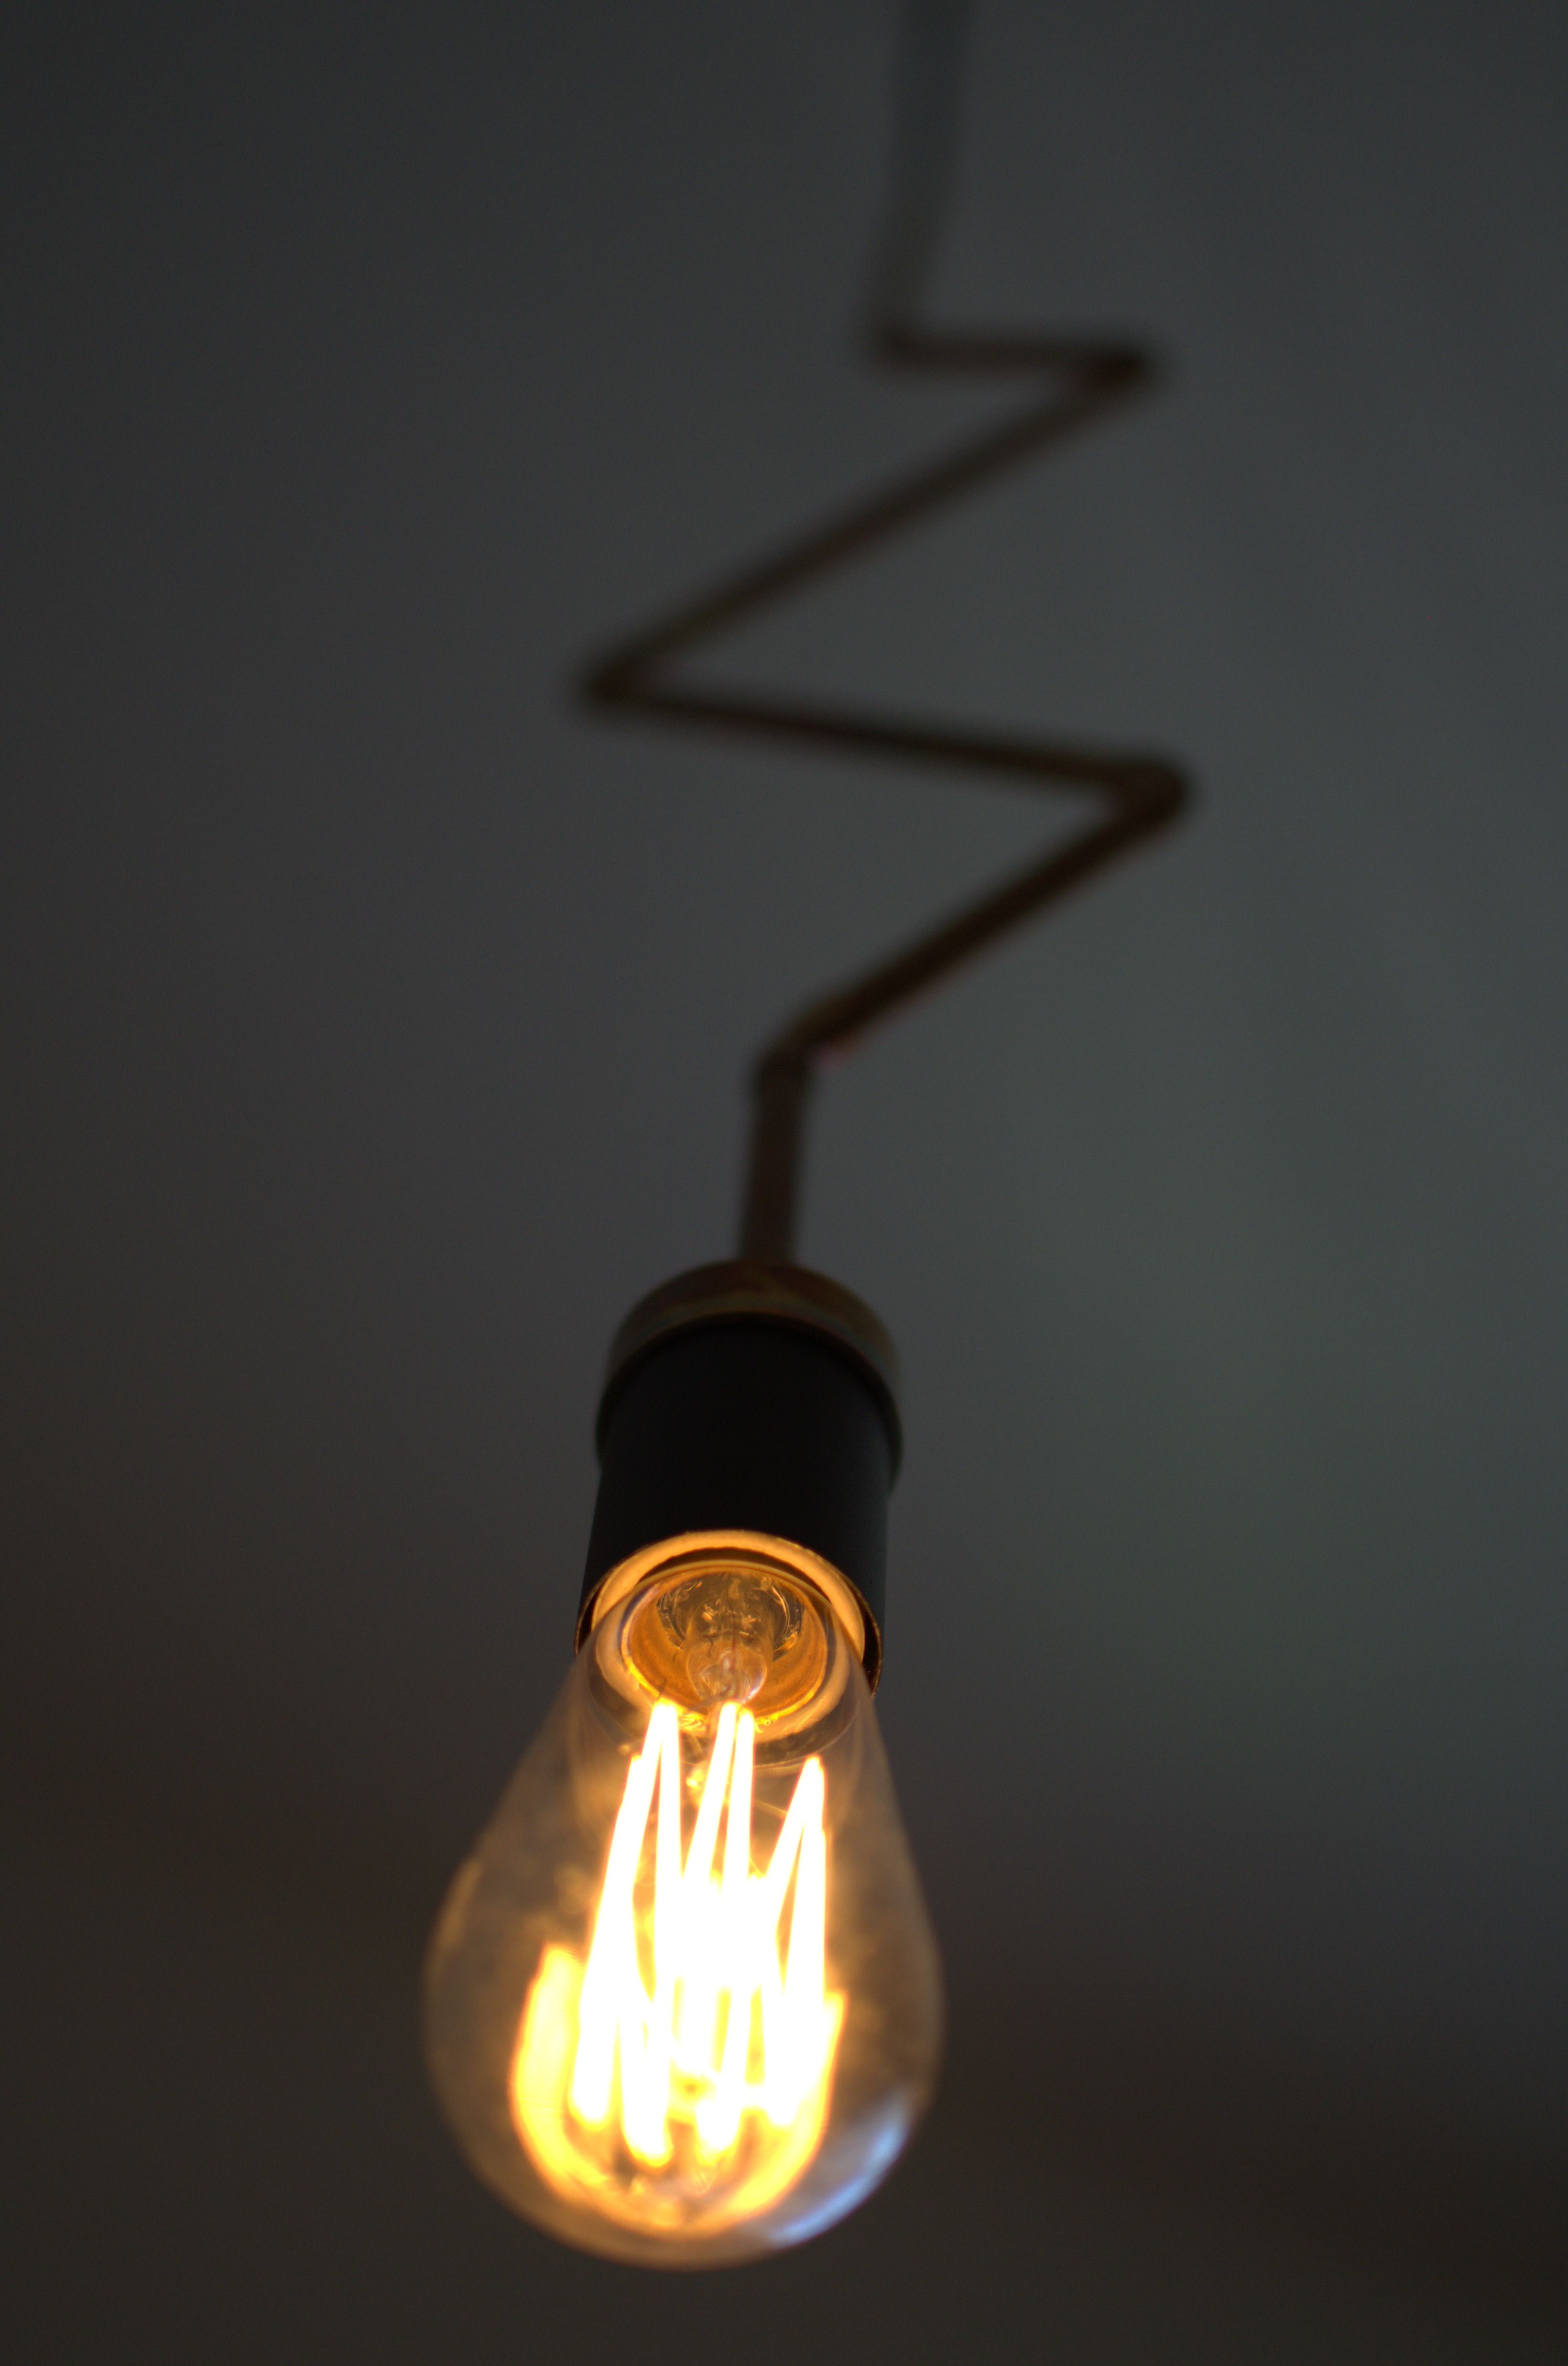 Plug In Pendant Light Industrial Lighting Geometric Copper Zig Zag Hanging Edison Lamp Chandelier Unique Lig Unique Items Products Light Fixtures Light